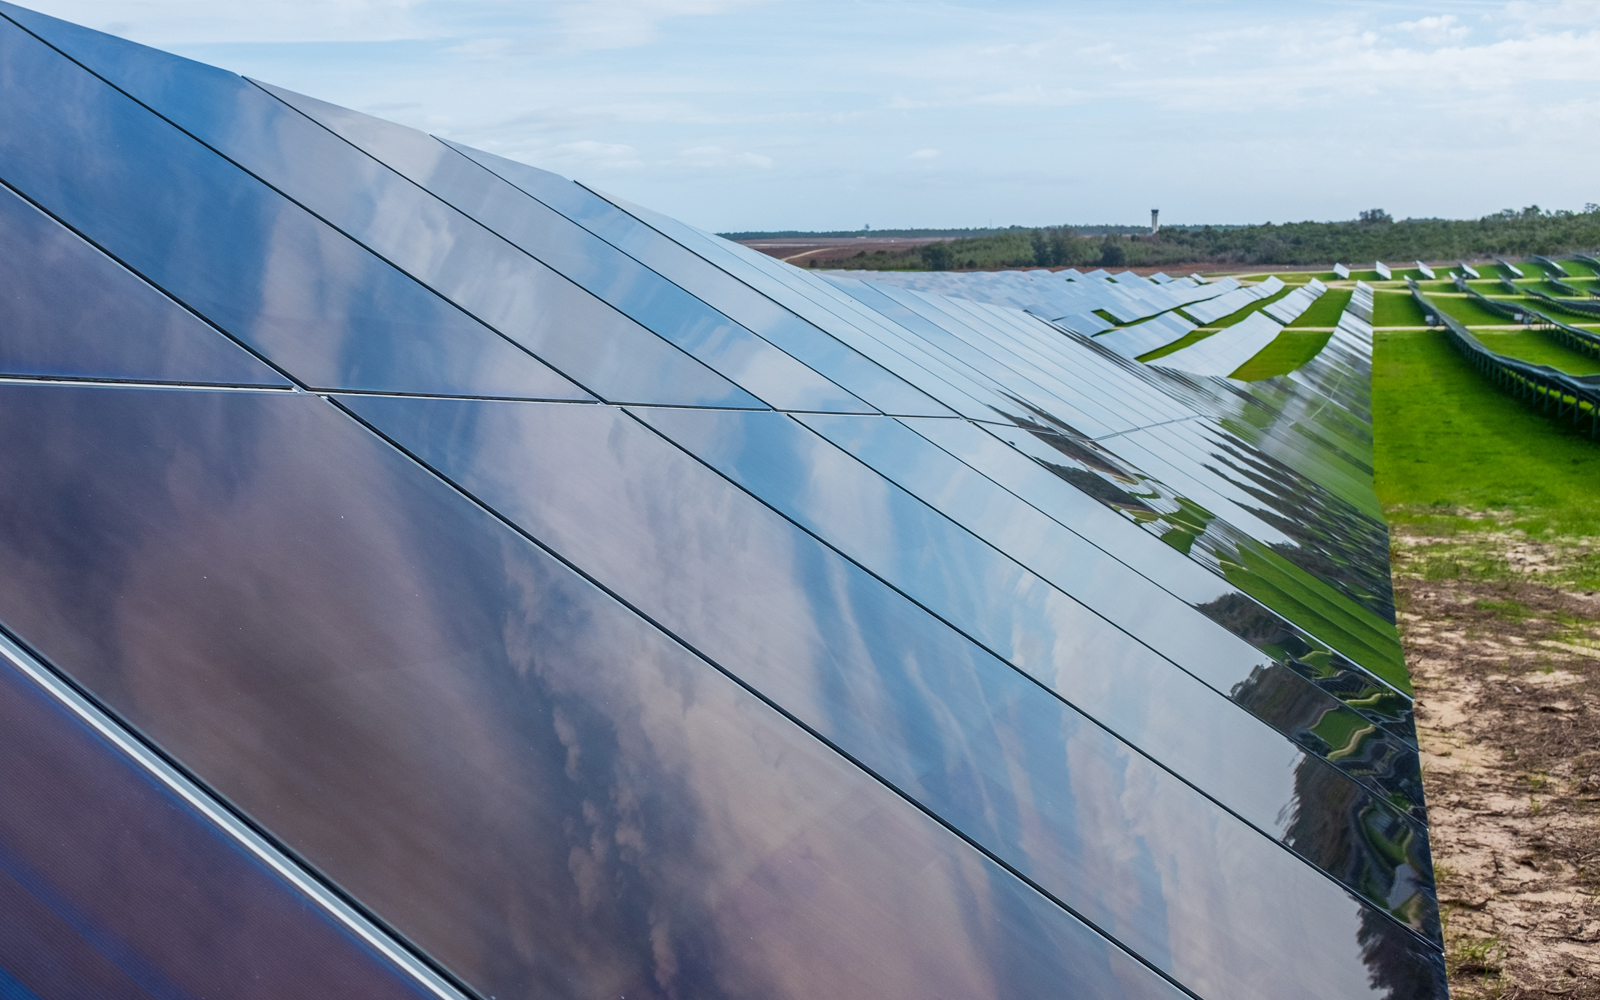 FL Solar 4 project image